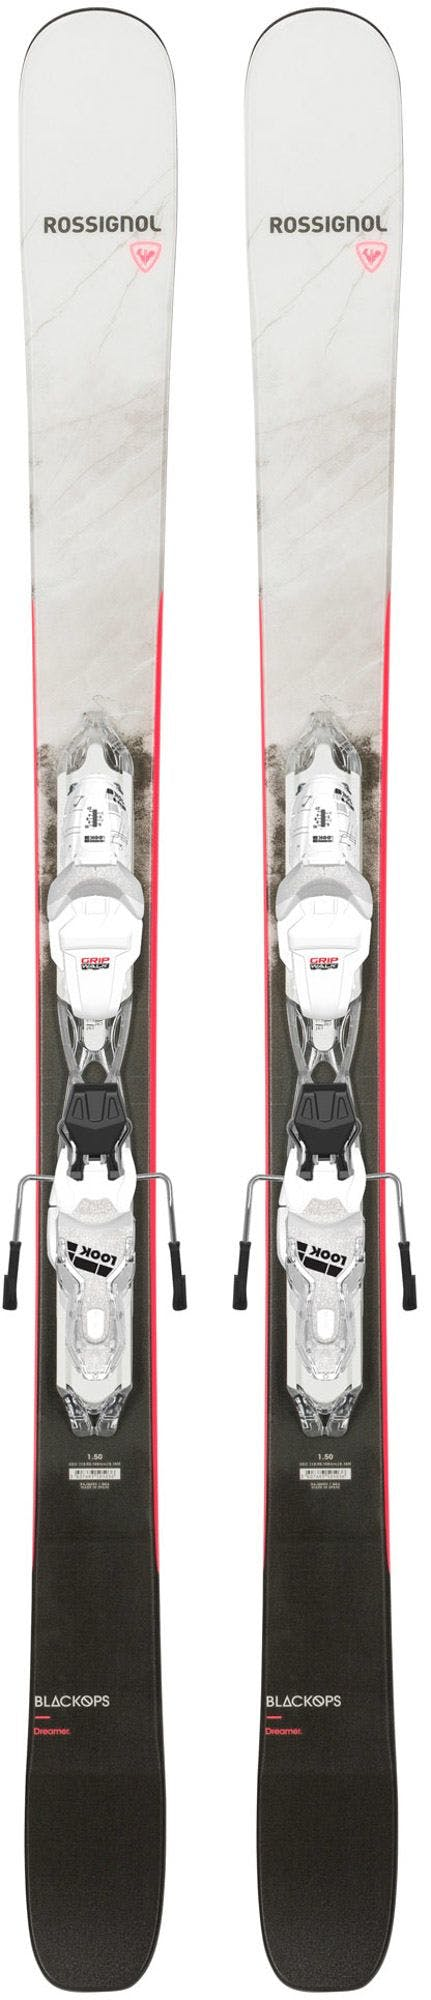 Rossignol Teen's Skis Blackops Women's Dreamer